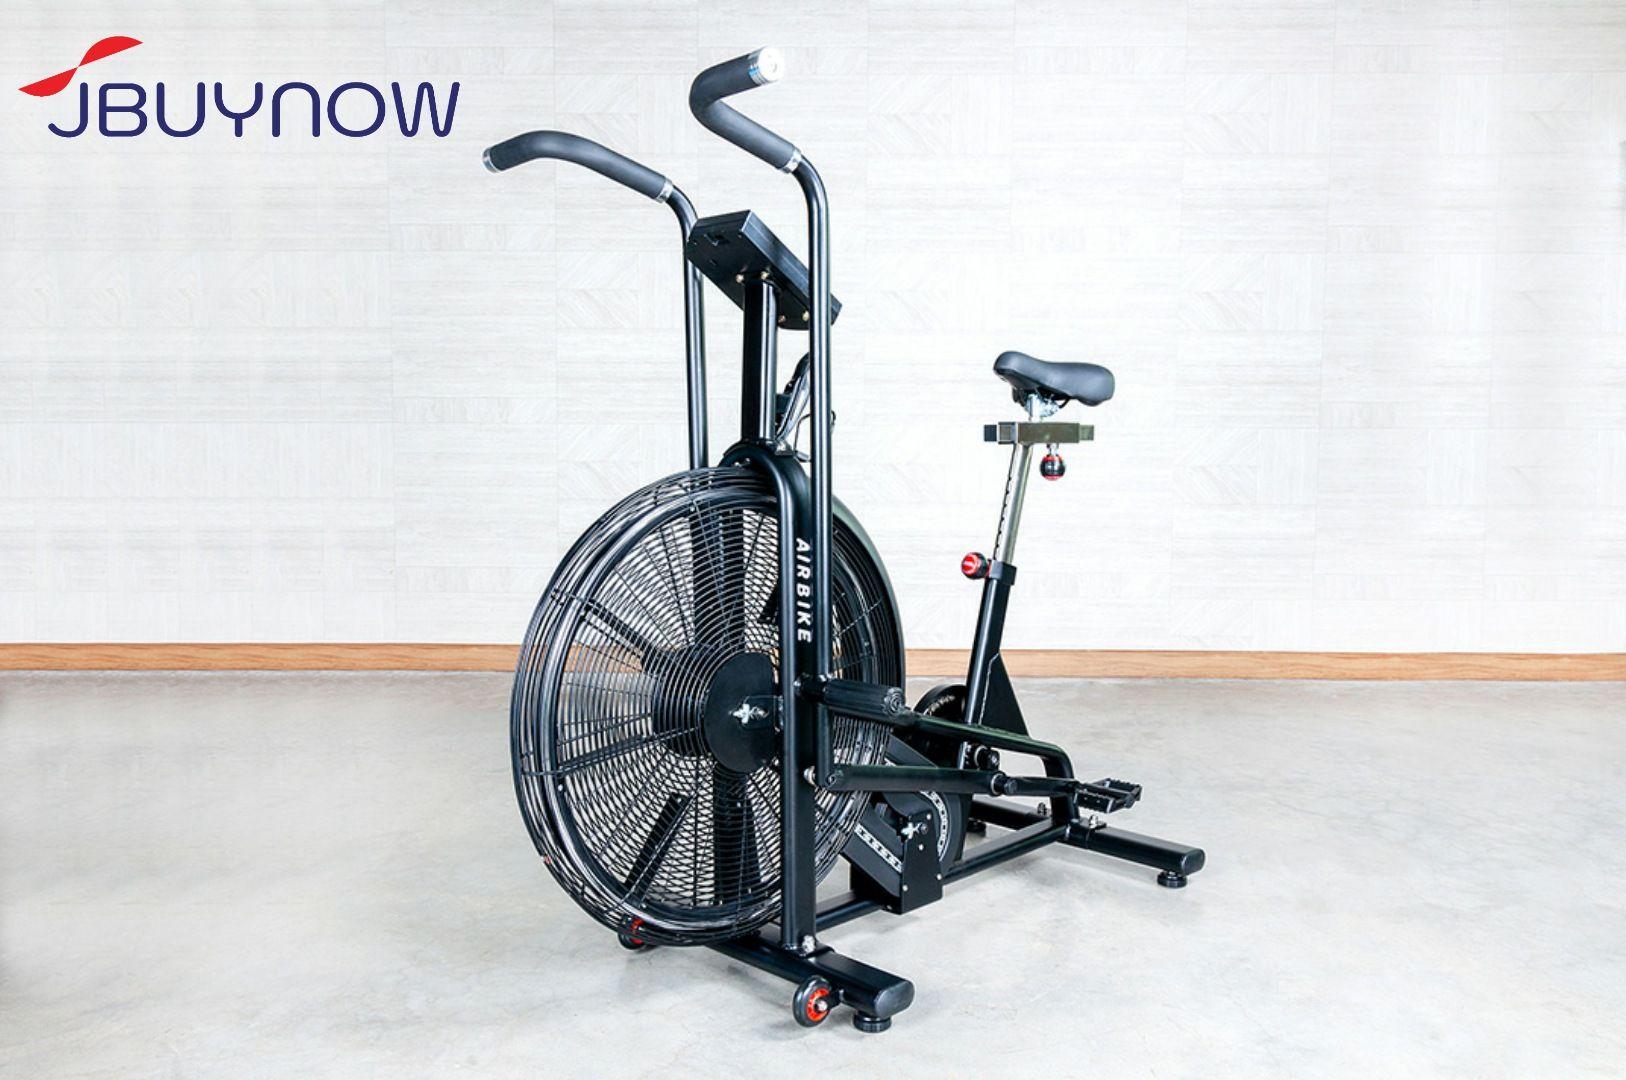 Fitness bicycle เครื่องปั่นจัก